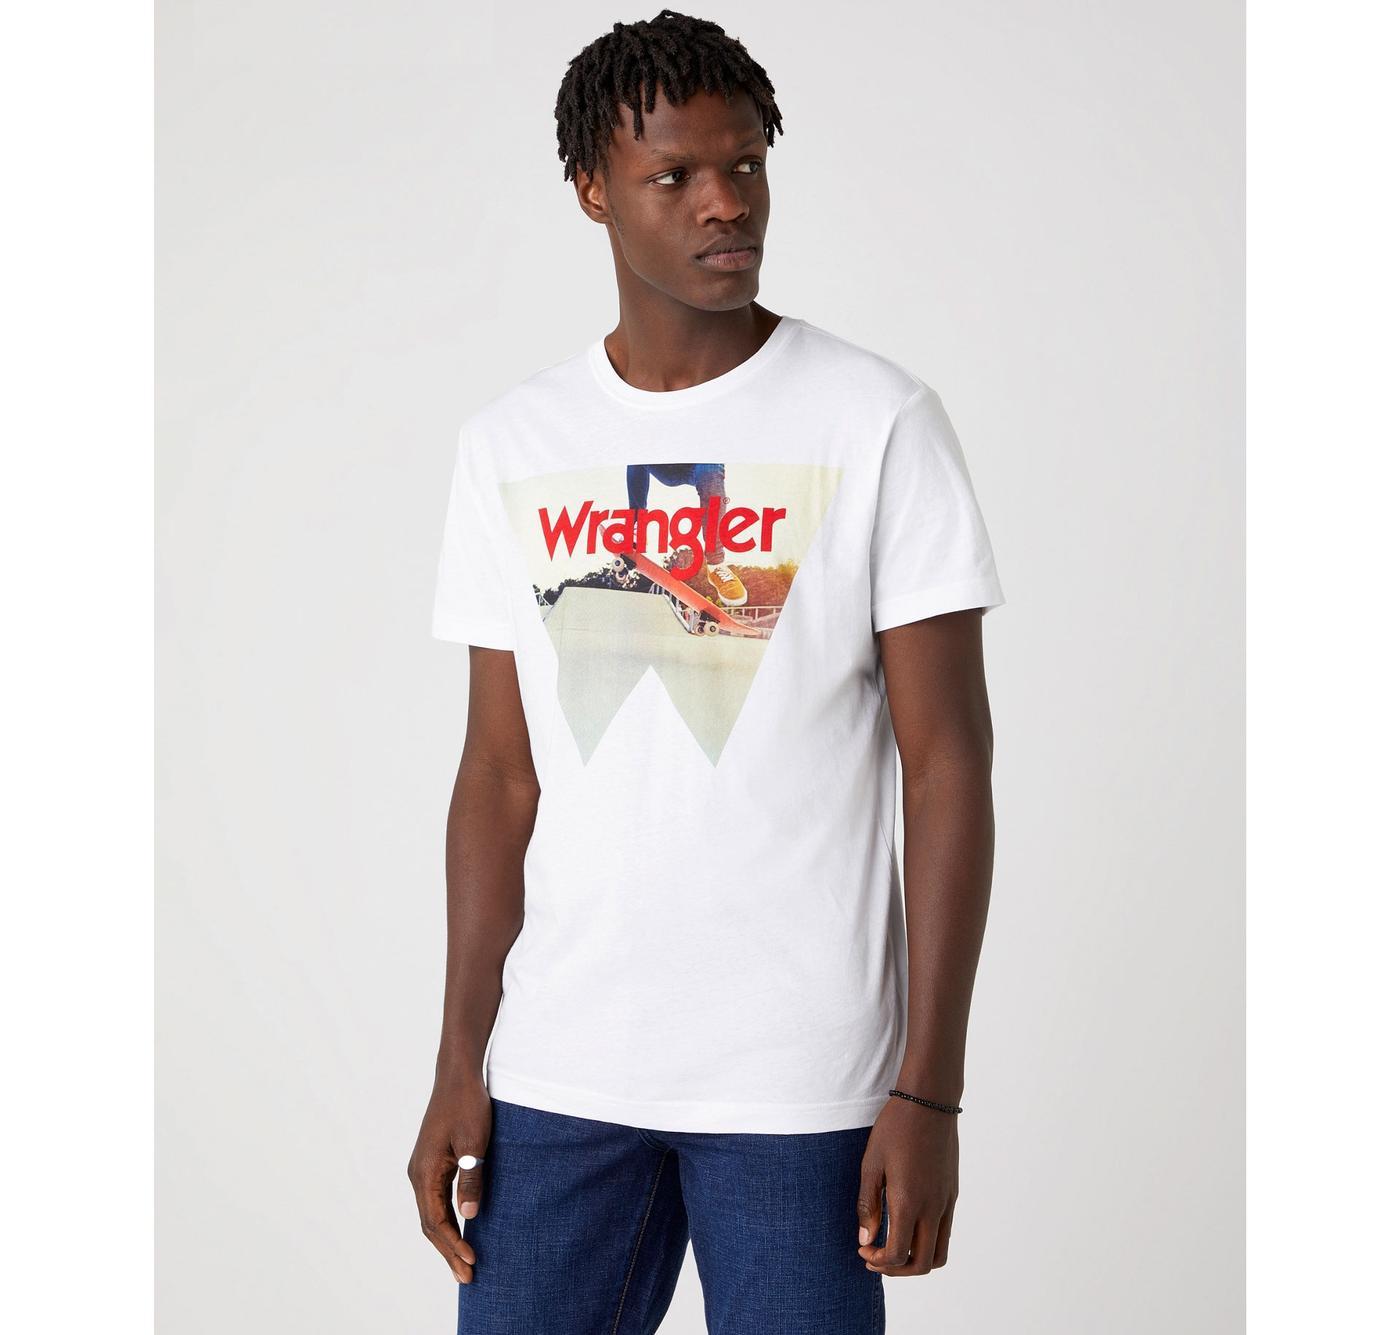 WRANGLER Retro Skatebaord Photo Logo T-shirt